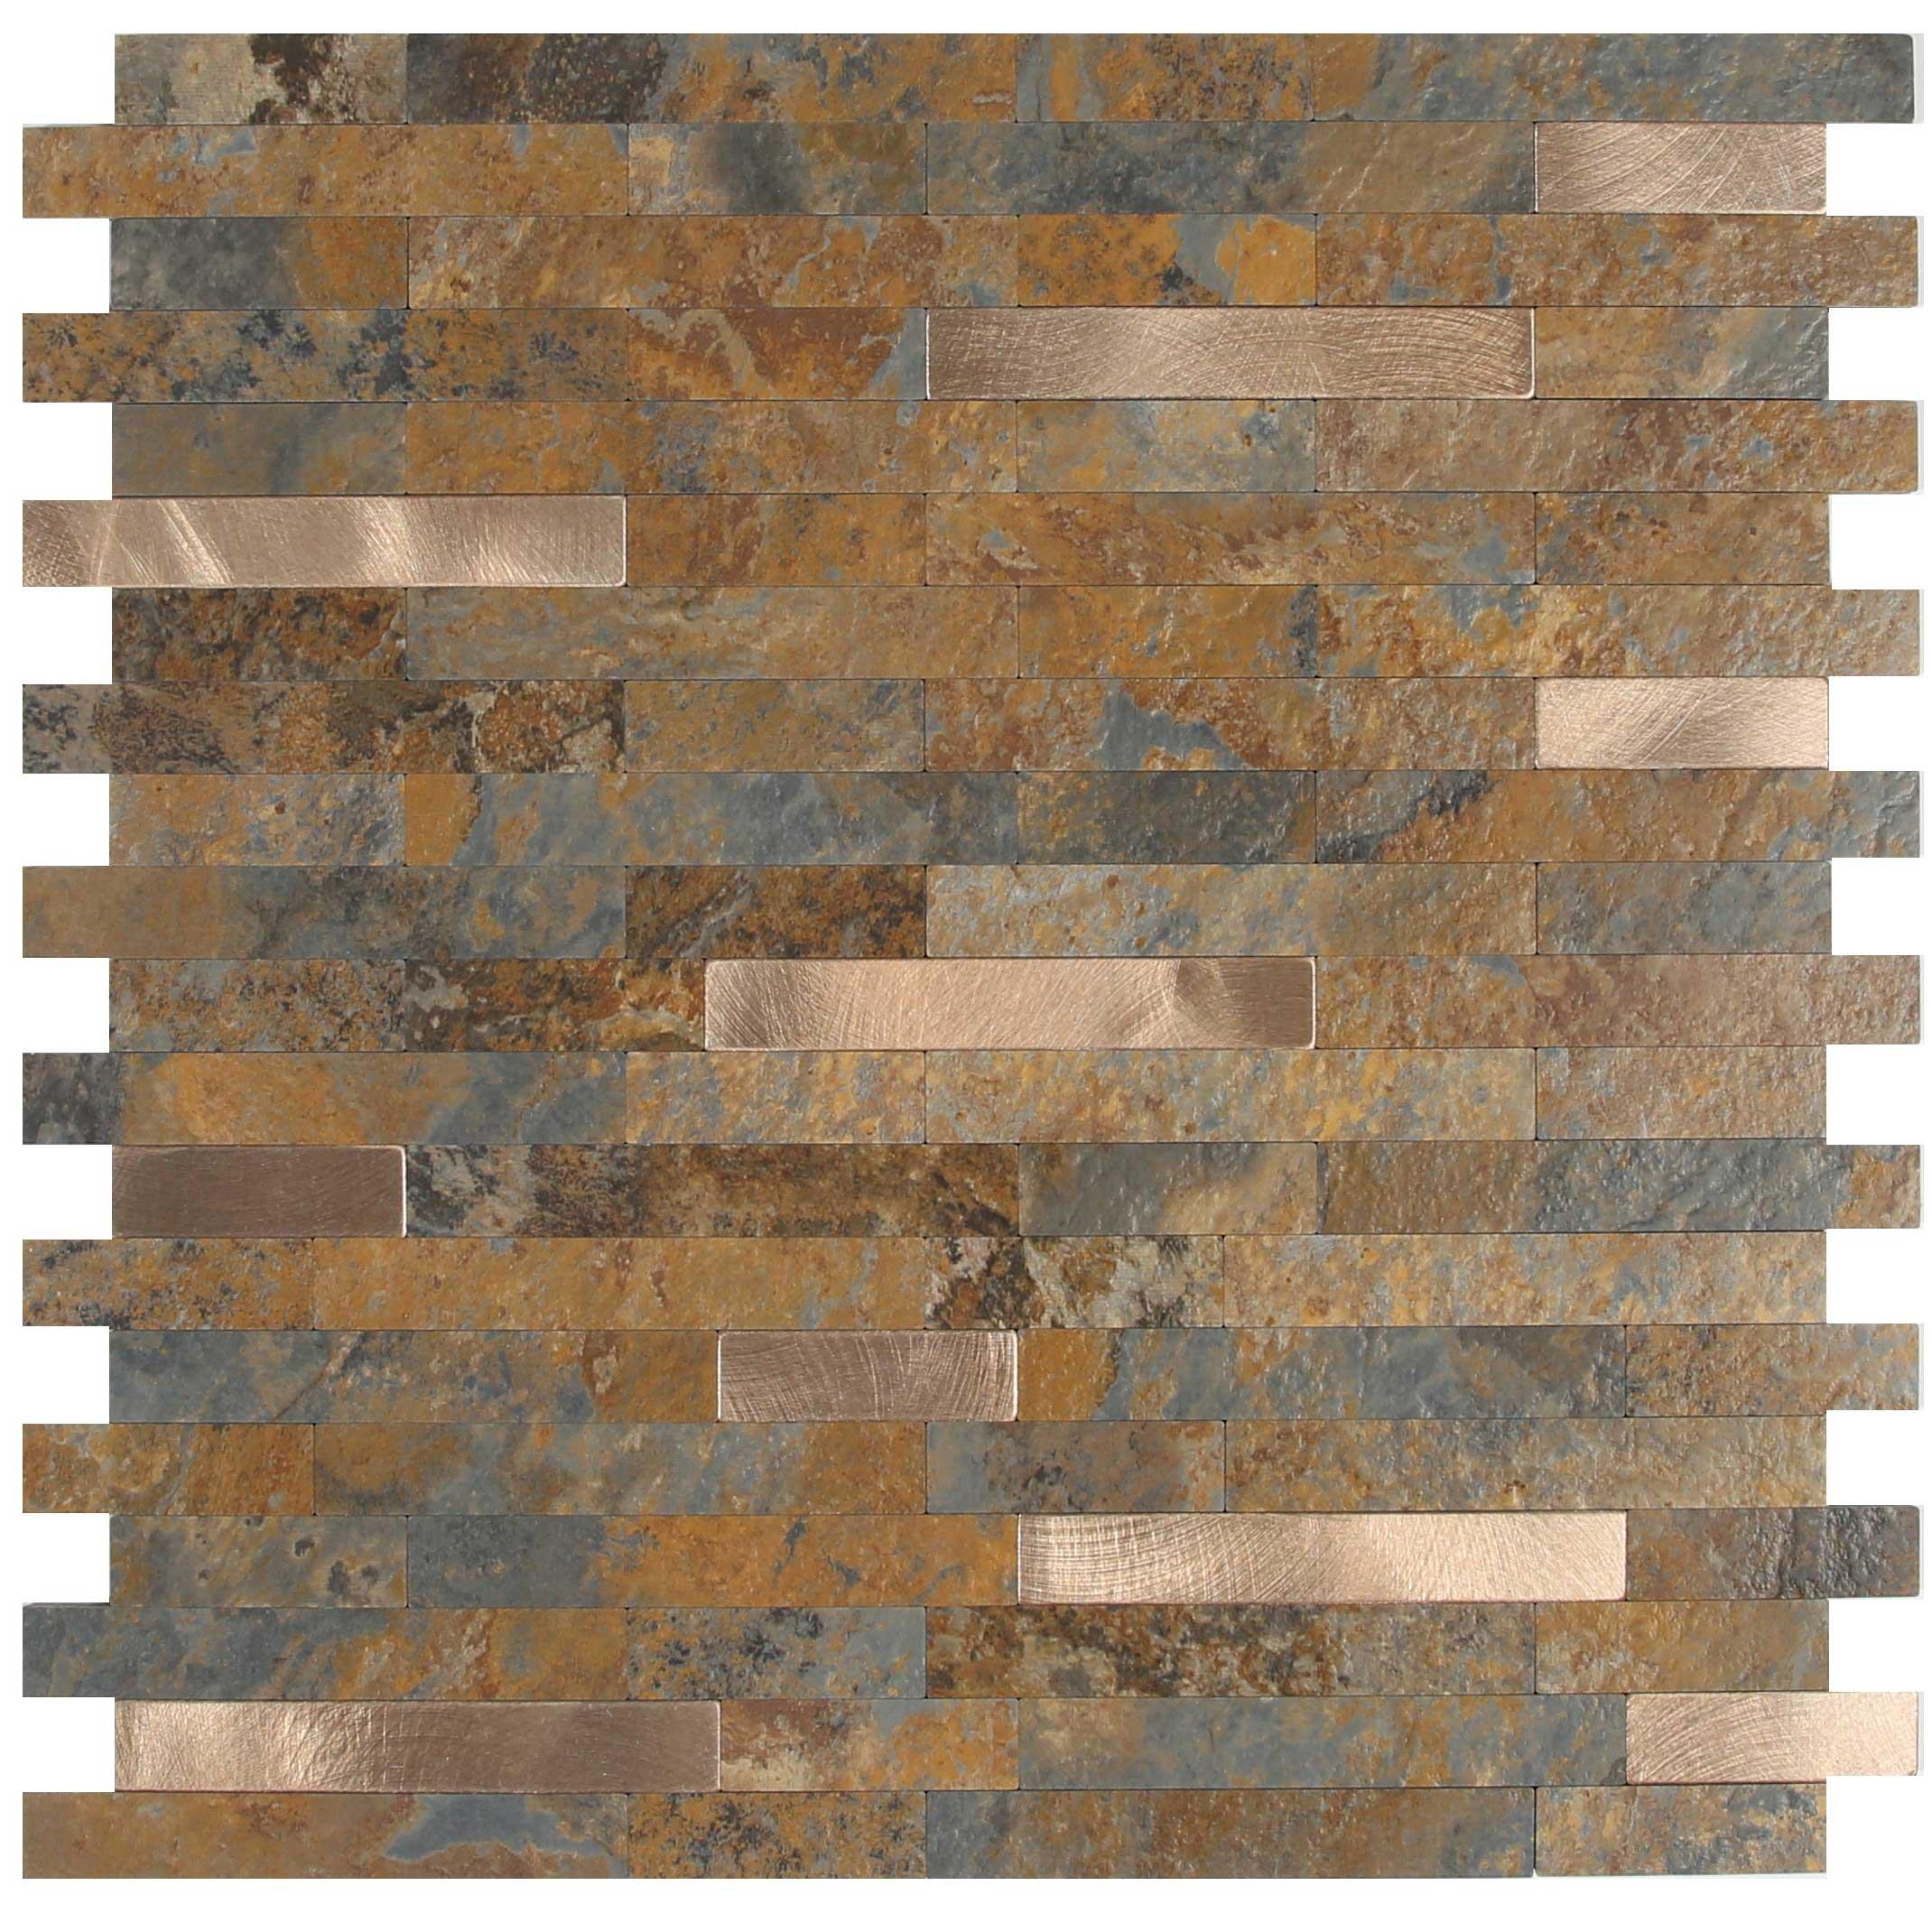 vividtiles peel stick stone tile backsplash metal wood square design 5sheet